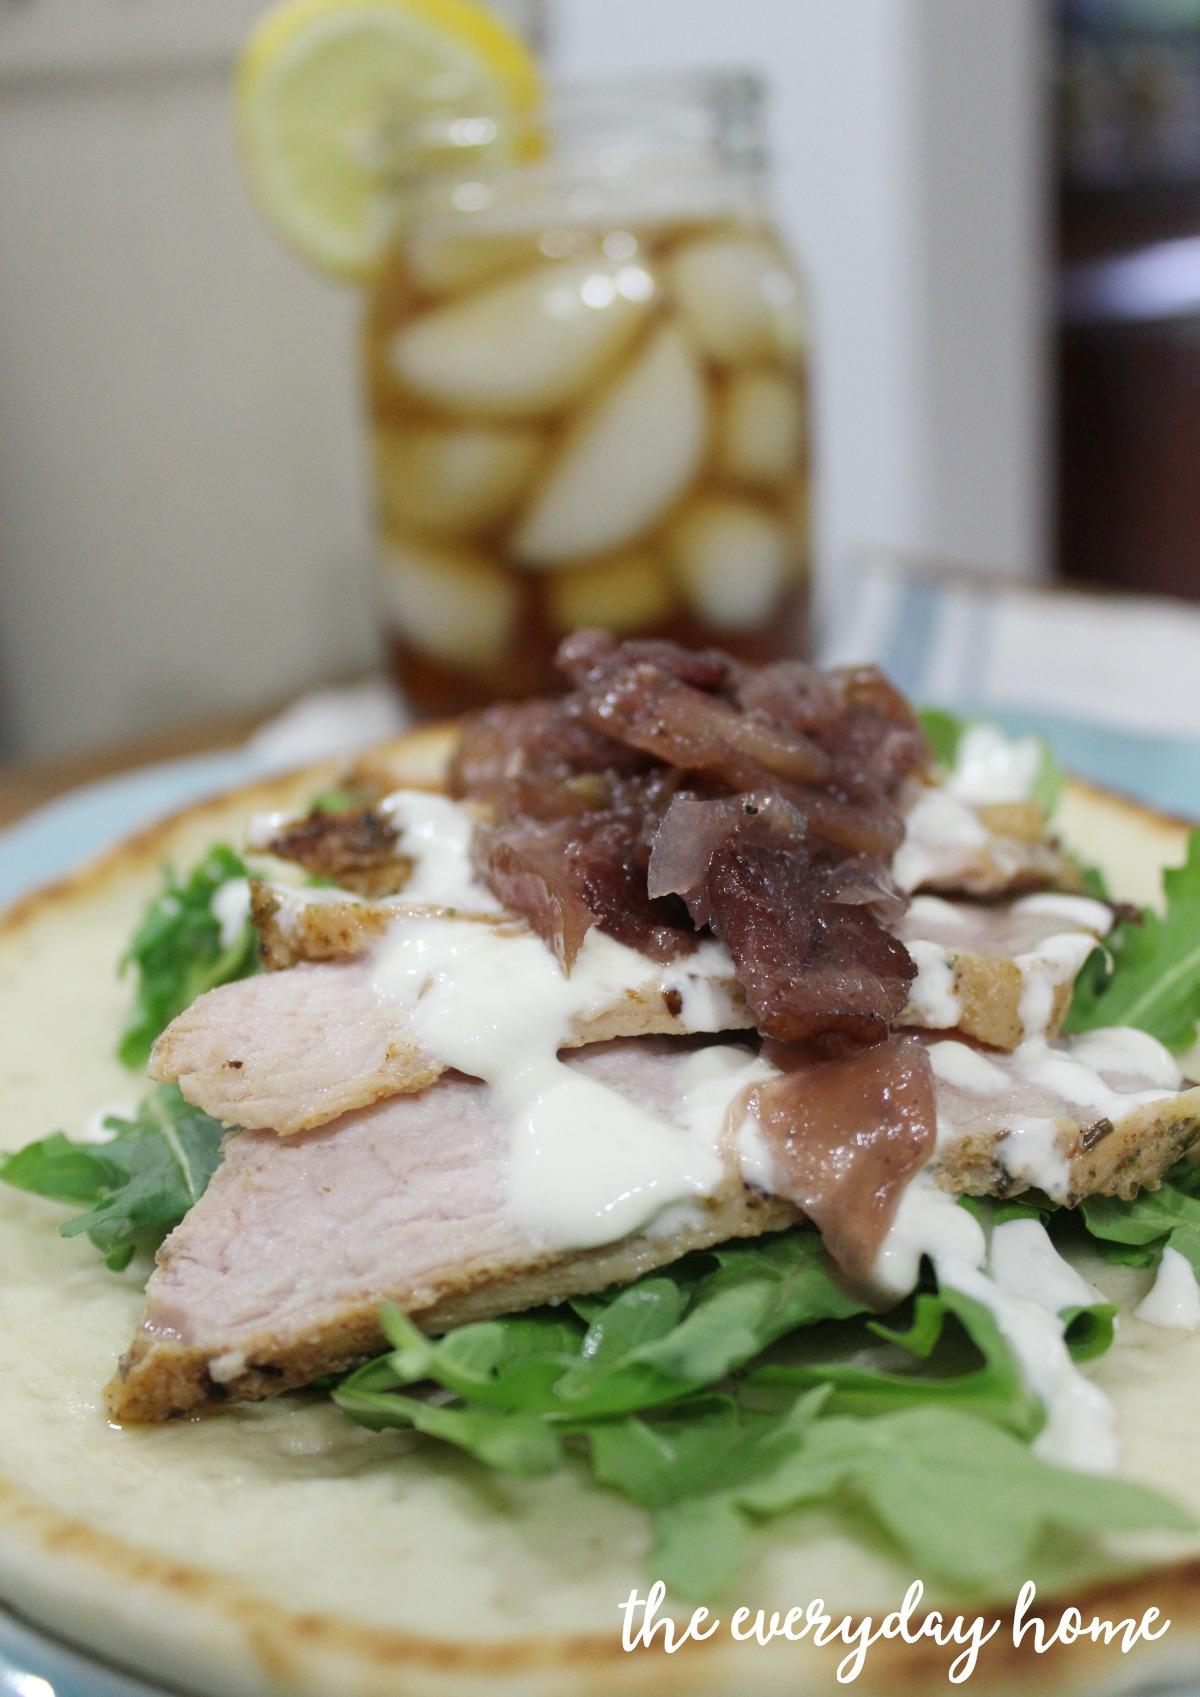 Roasted Pork Flatbread with Bacon-Apple-Onion Jam | The Everyday Home | www.everydayhomeblog.com